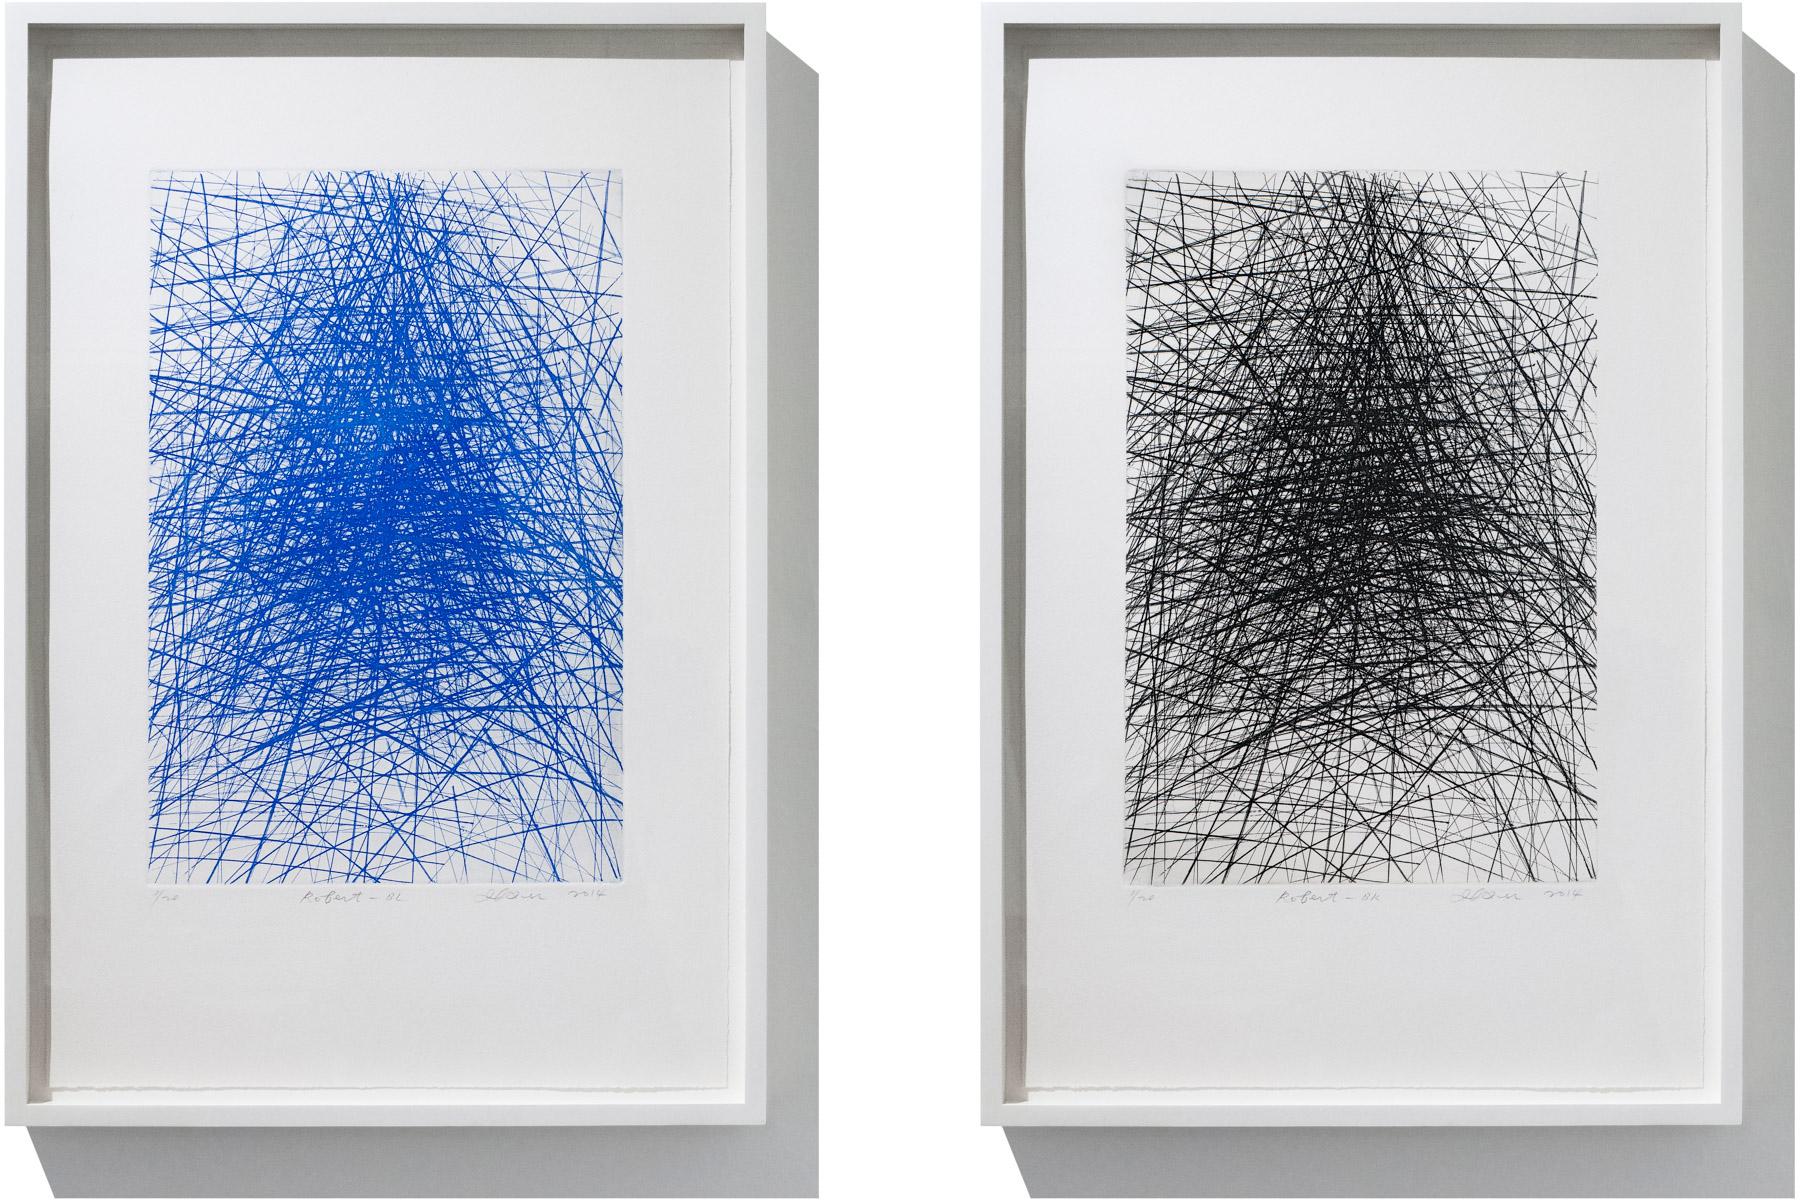 IL LEE,Robert-BLandRobert-BK, 2014, etching on paper